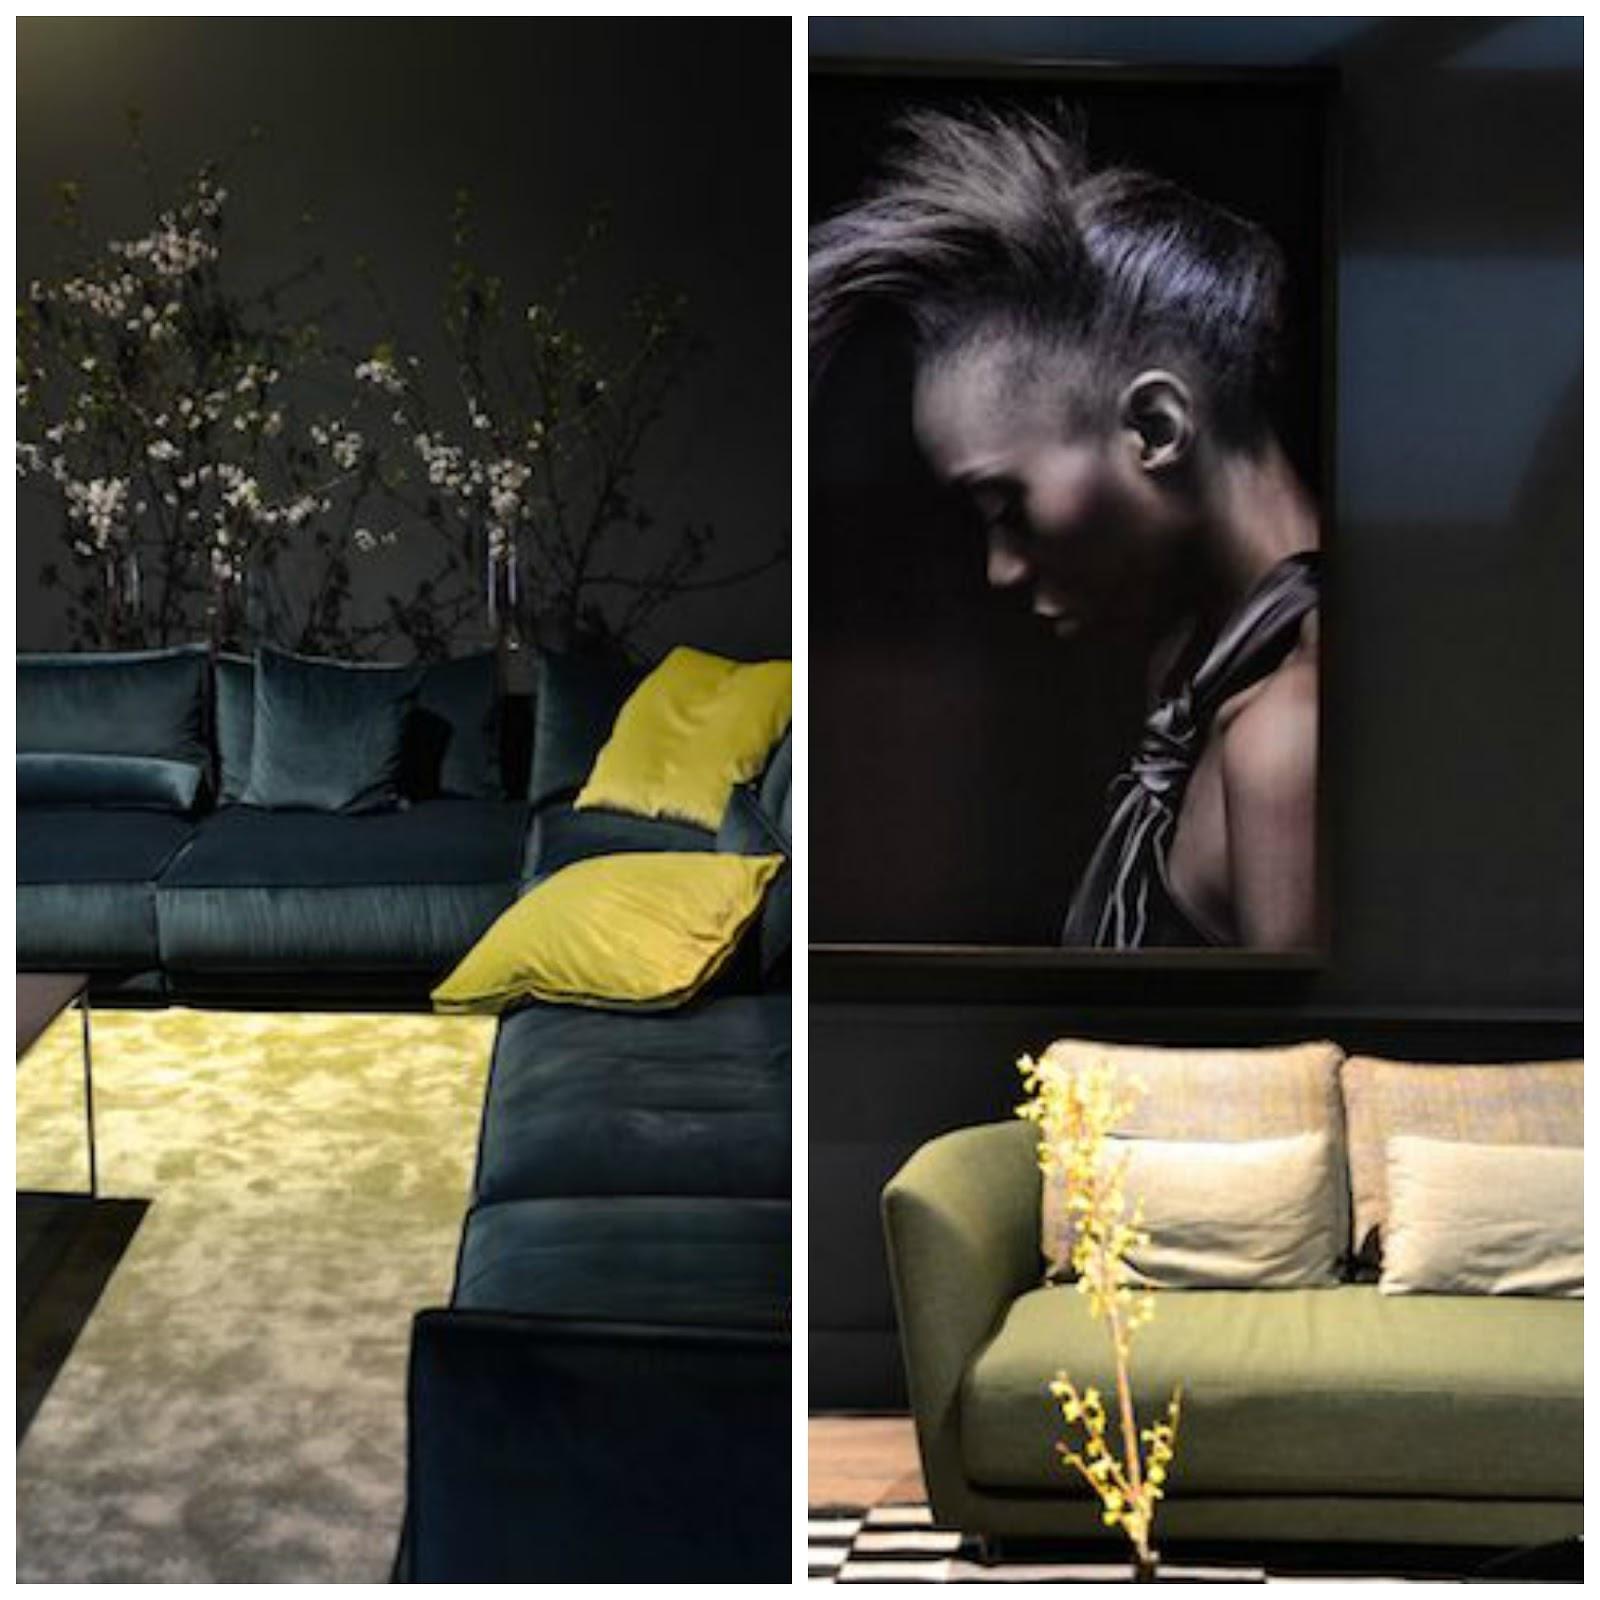 Indra sripal interior design